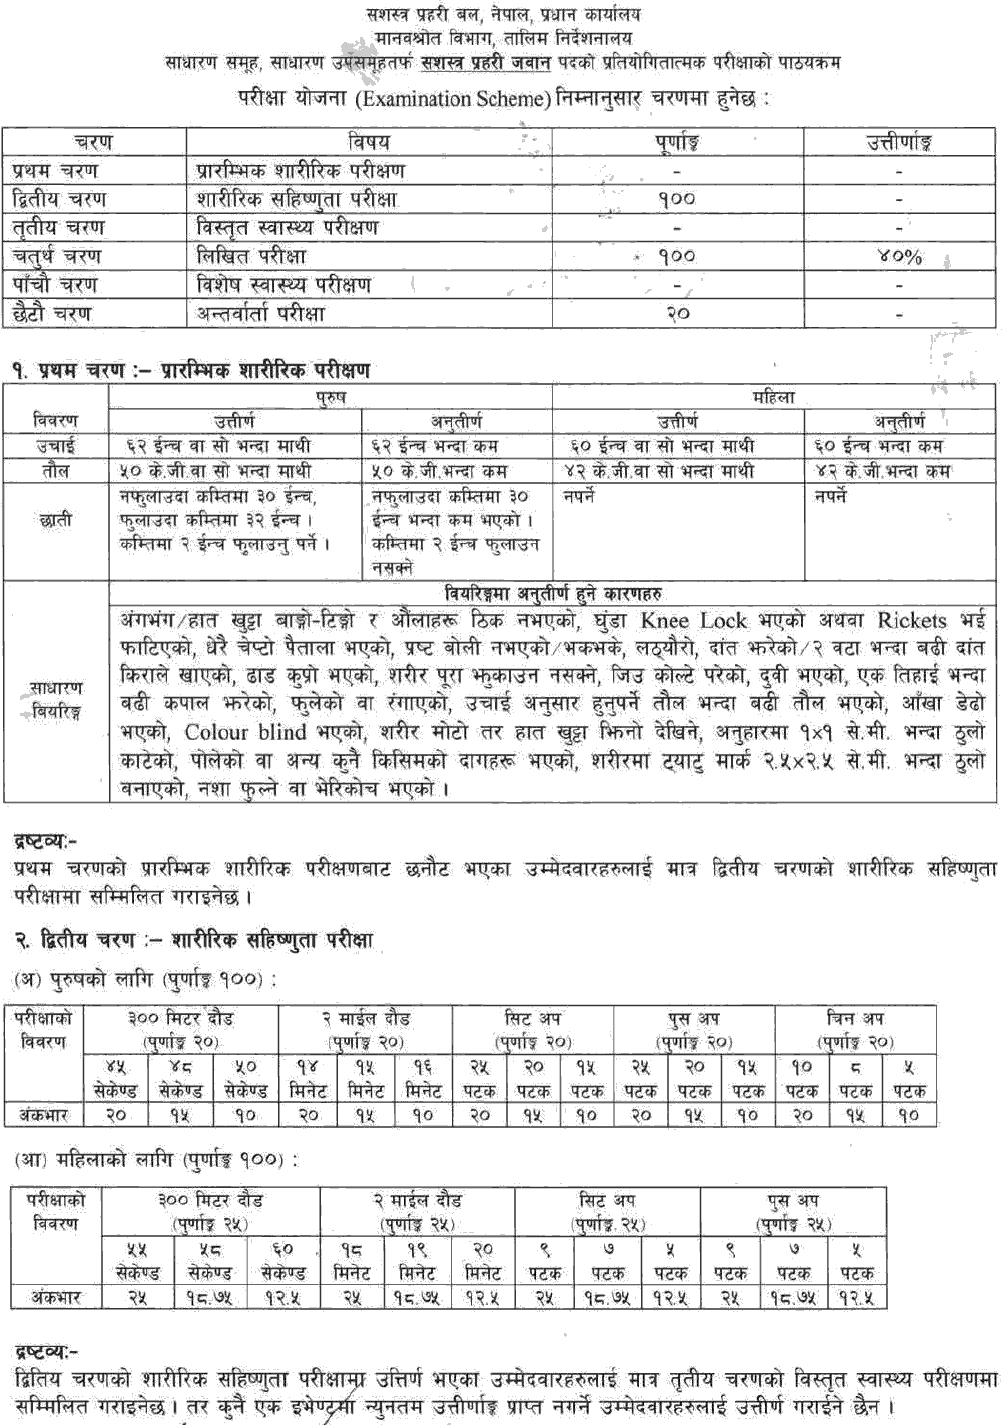 APF Nepal (Sashastra Prahari) Jawan Post Syllabus